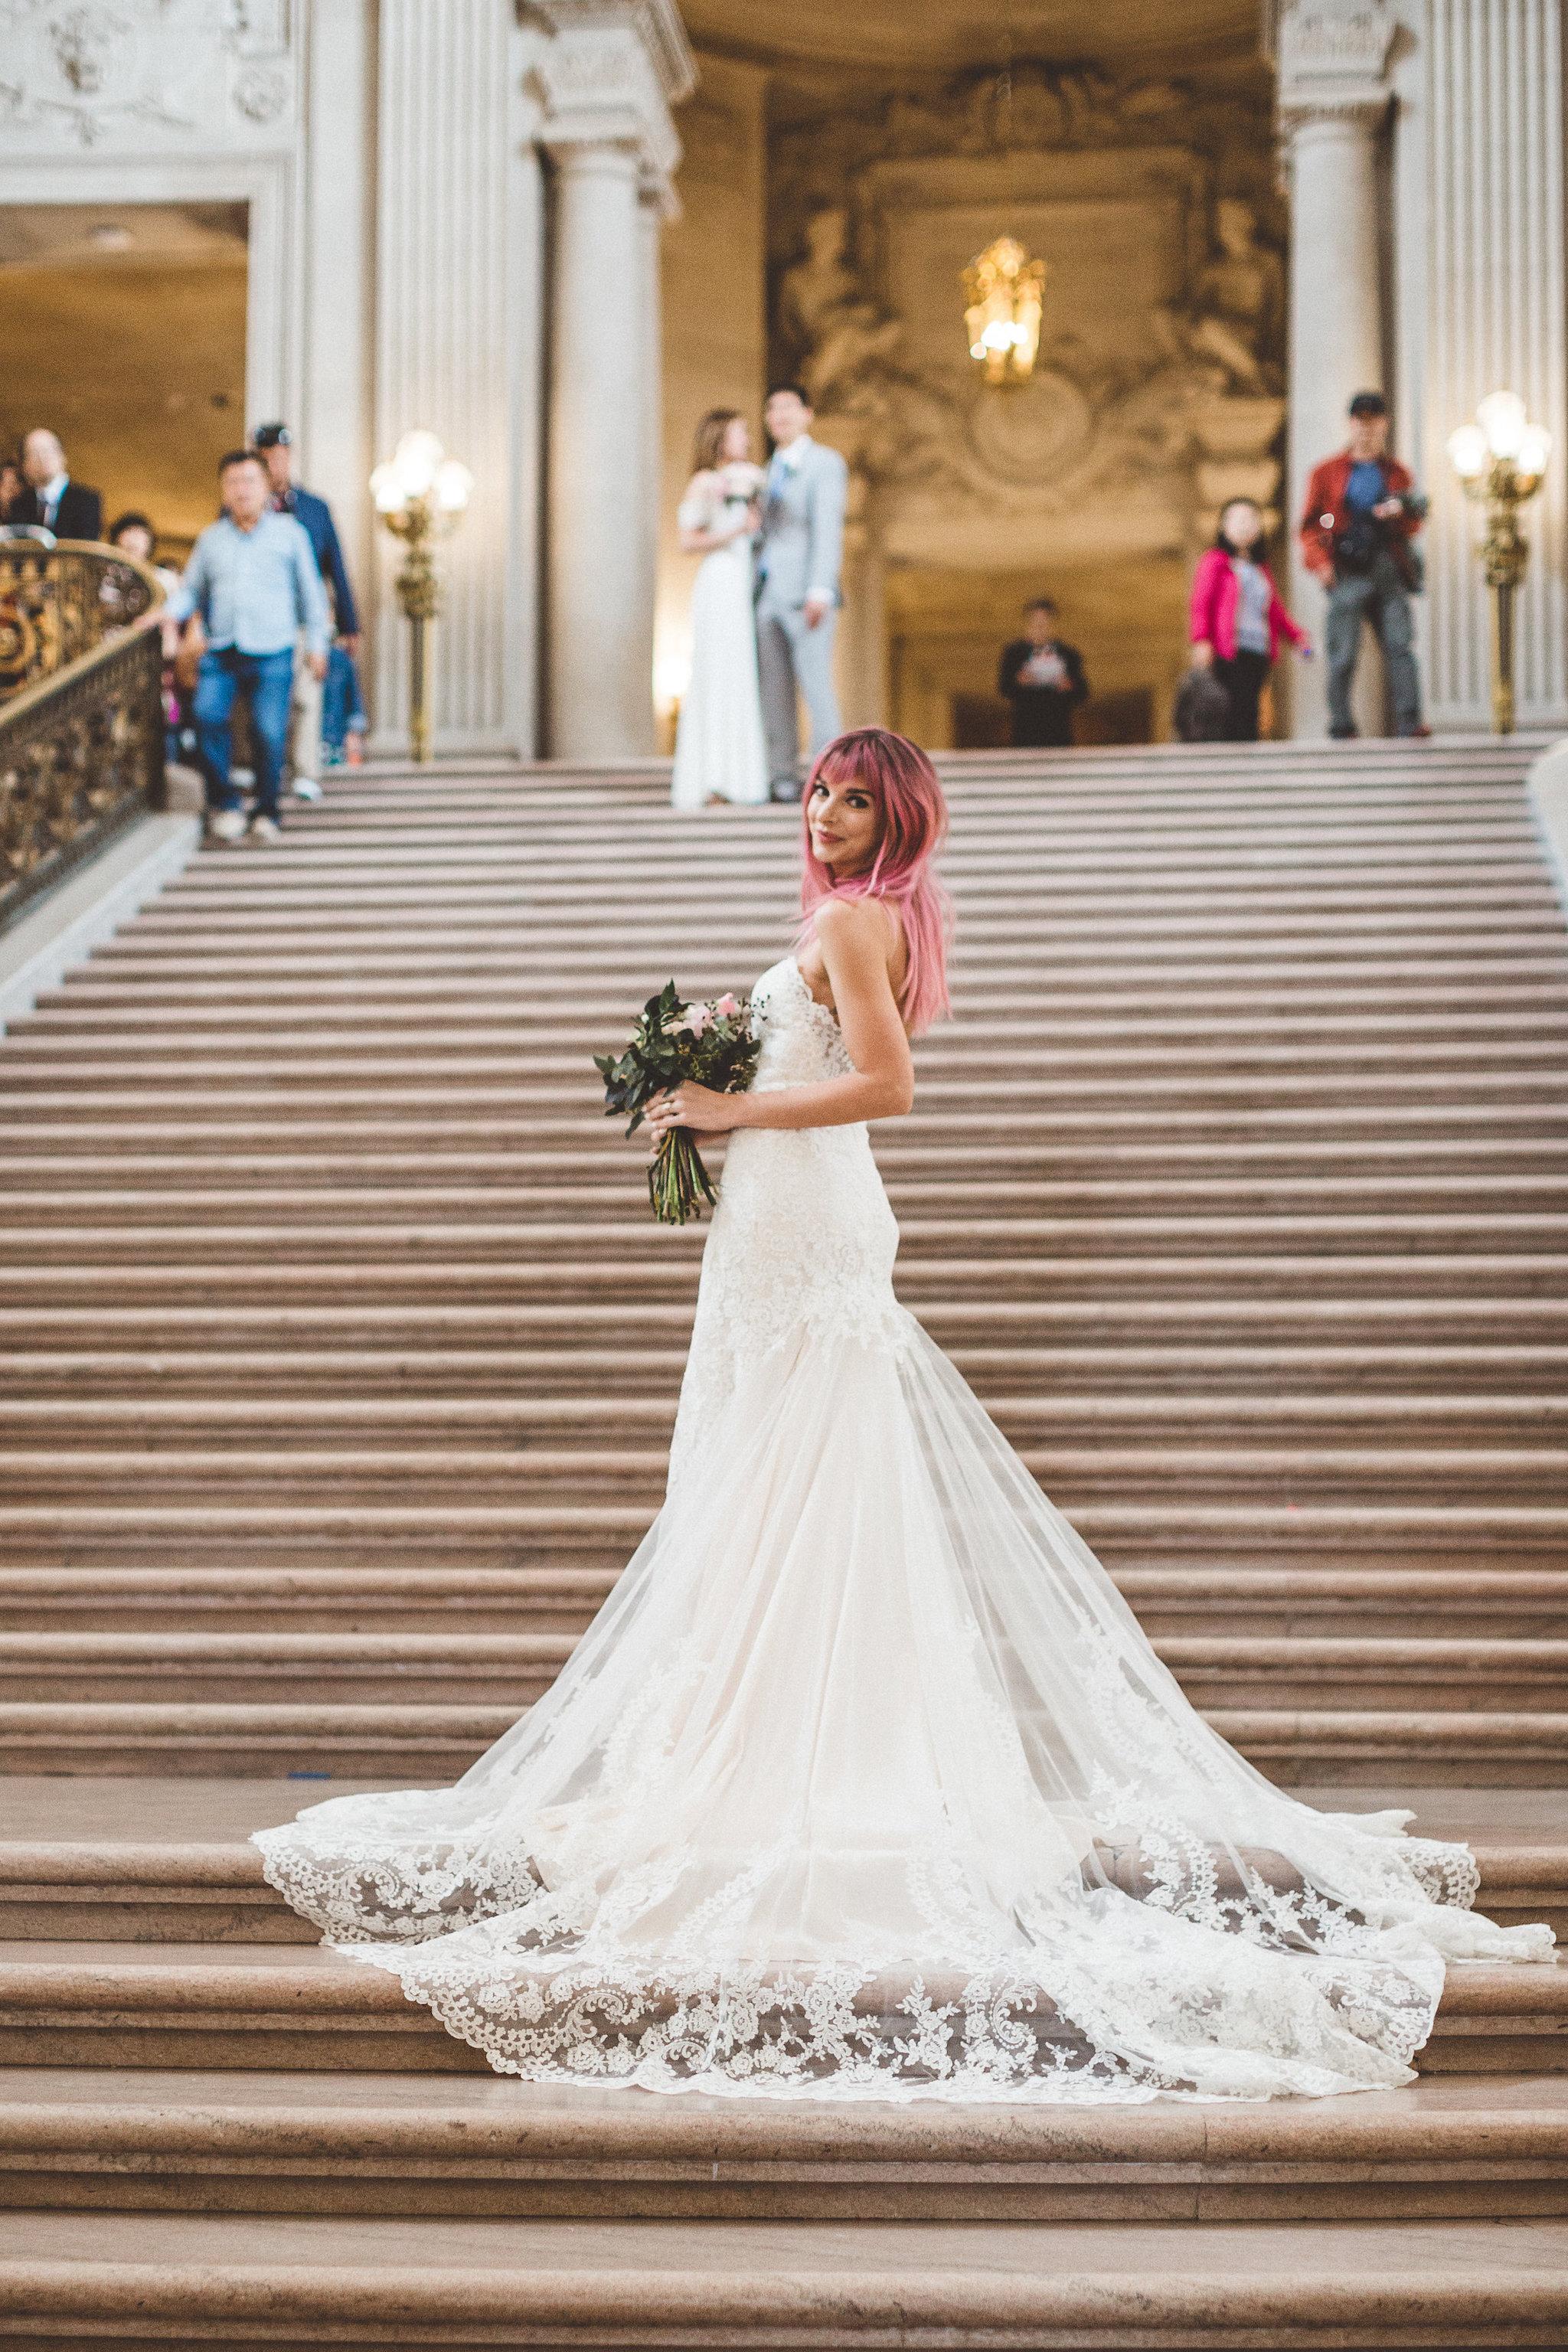 kris-and-andreas-san-francisco-elopement-adventure18.jpg